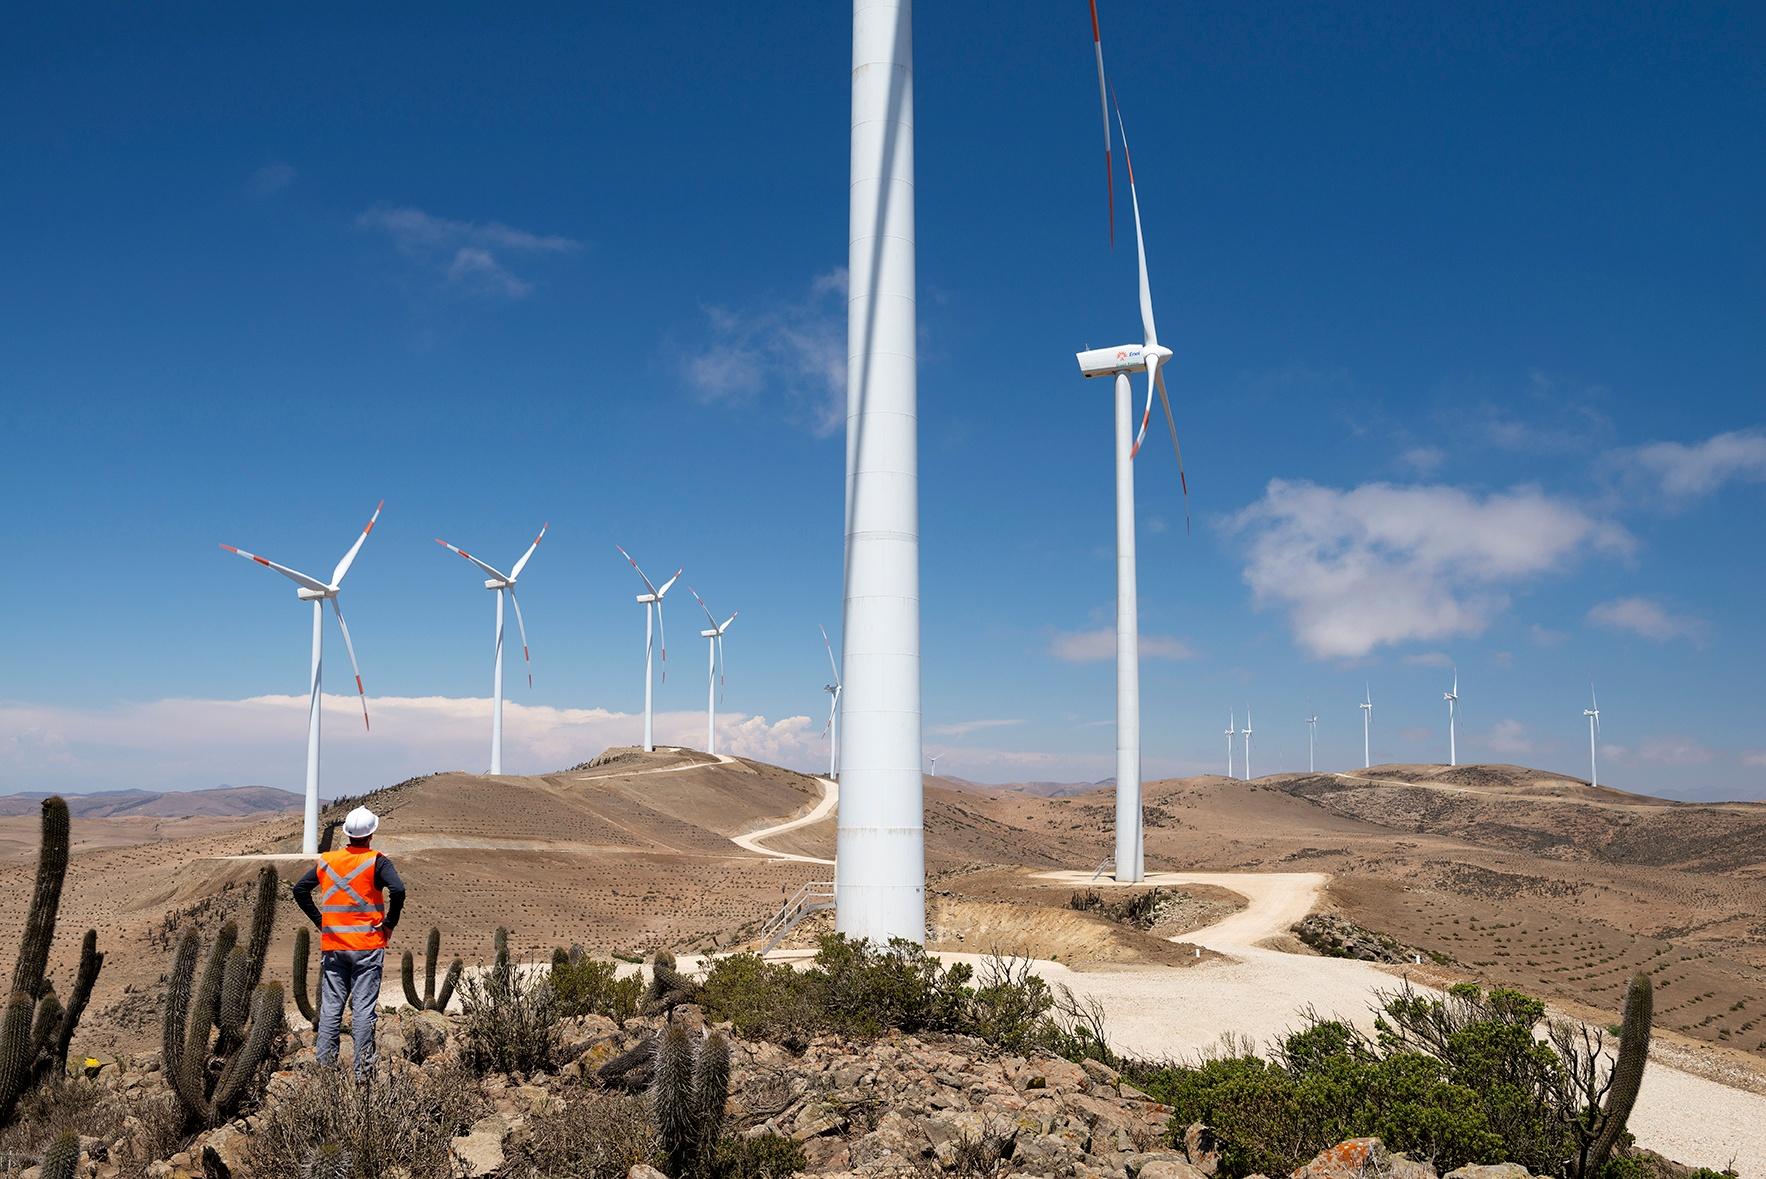 448 energia eolica cie 2015